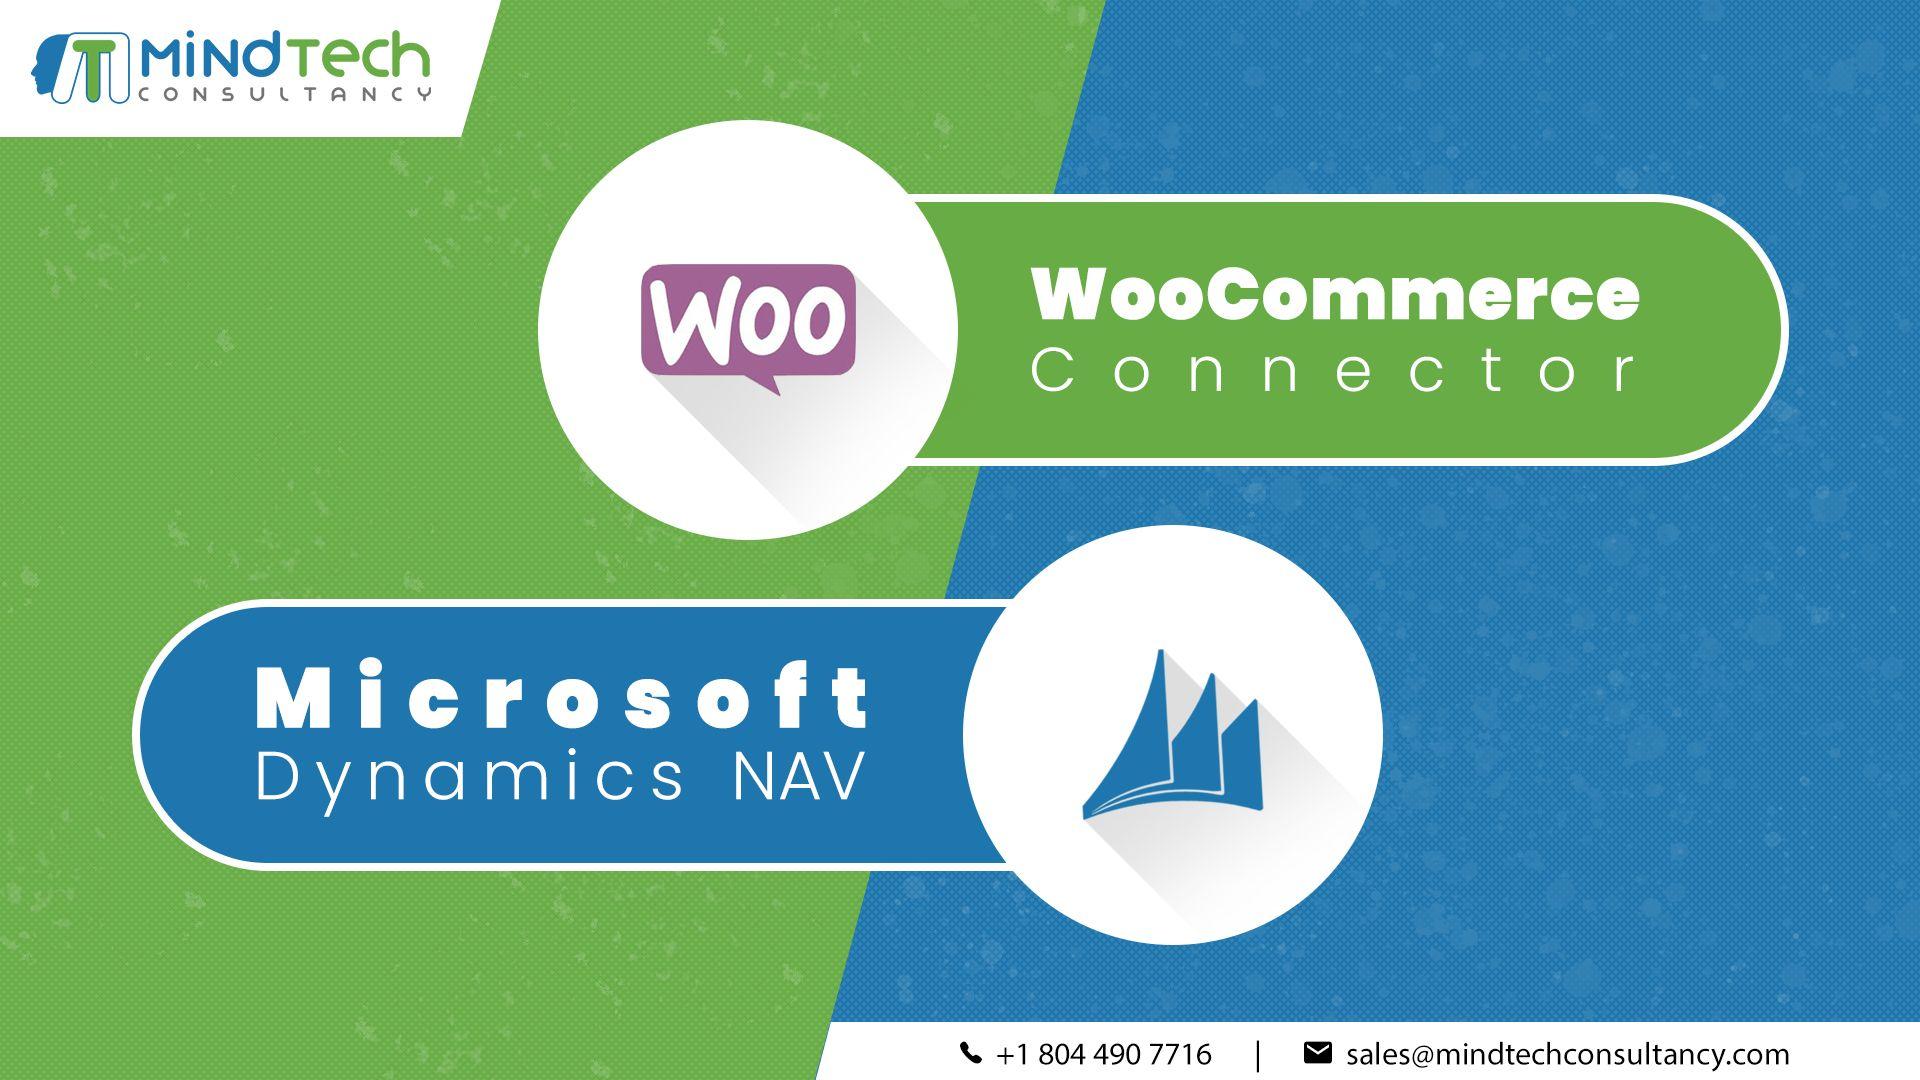 Connector for Microsoft Dynamics NAV